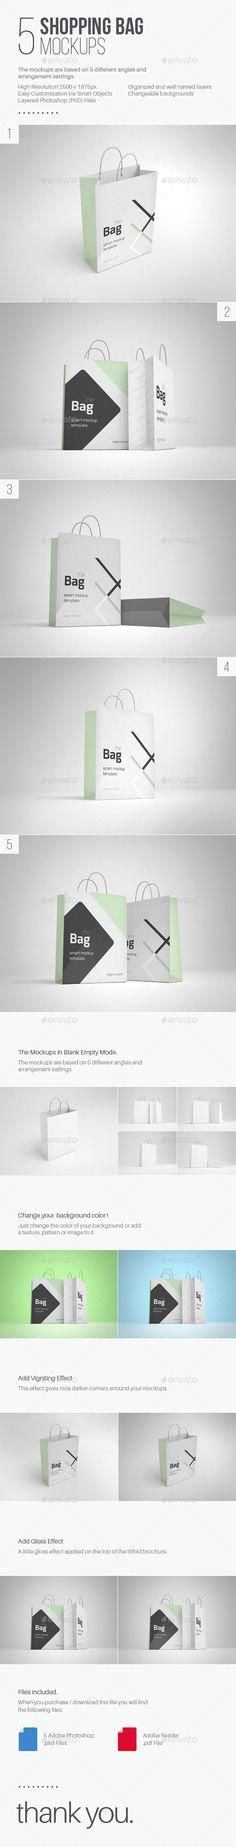 5 Shopping Bag Mockups Download here: https://graphicriver.net/item/5-shopping-bag-mockups/9299835?ref=KlitVogli